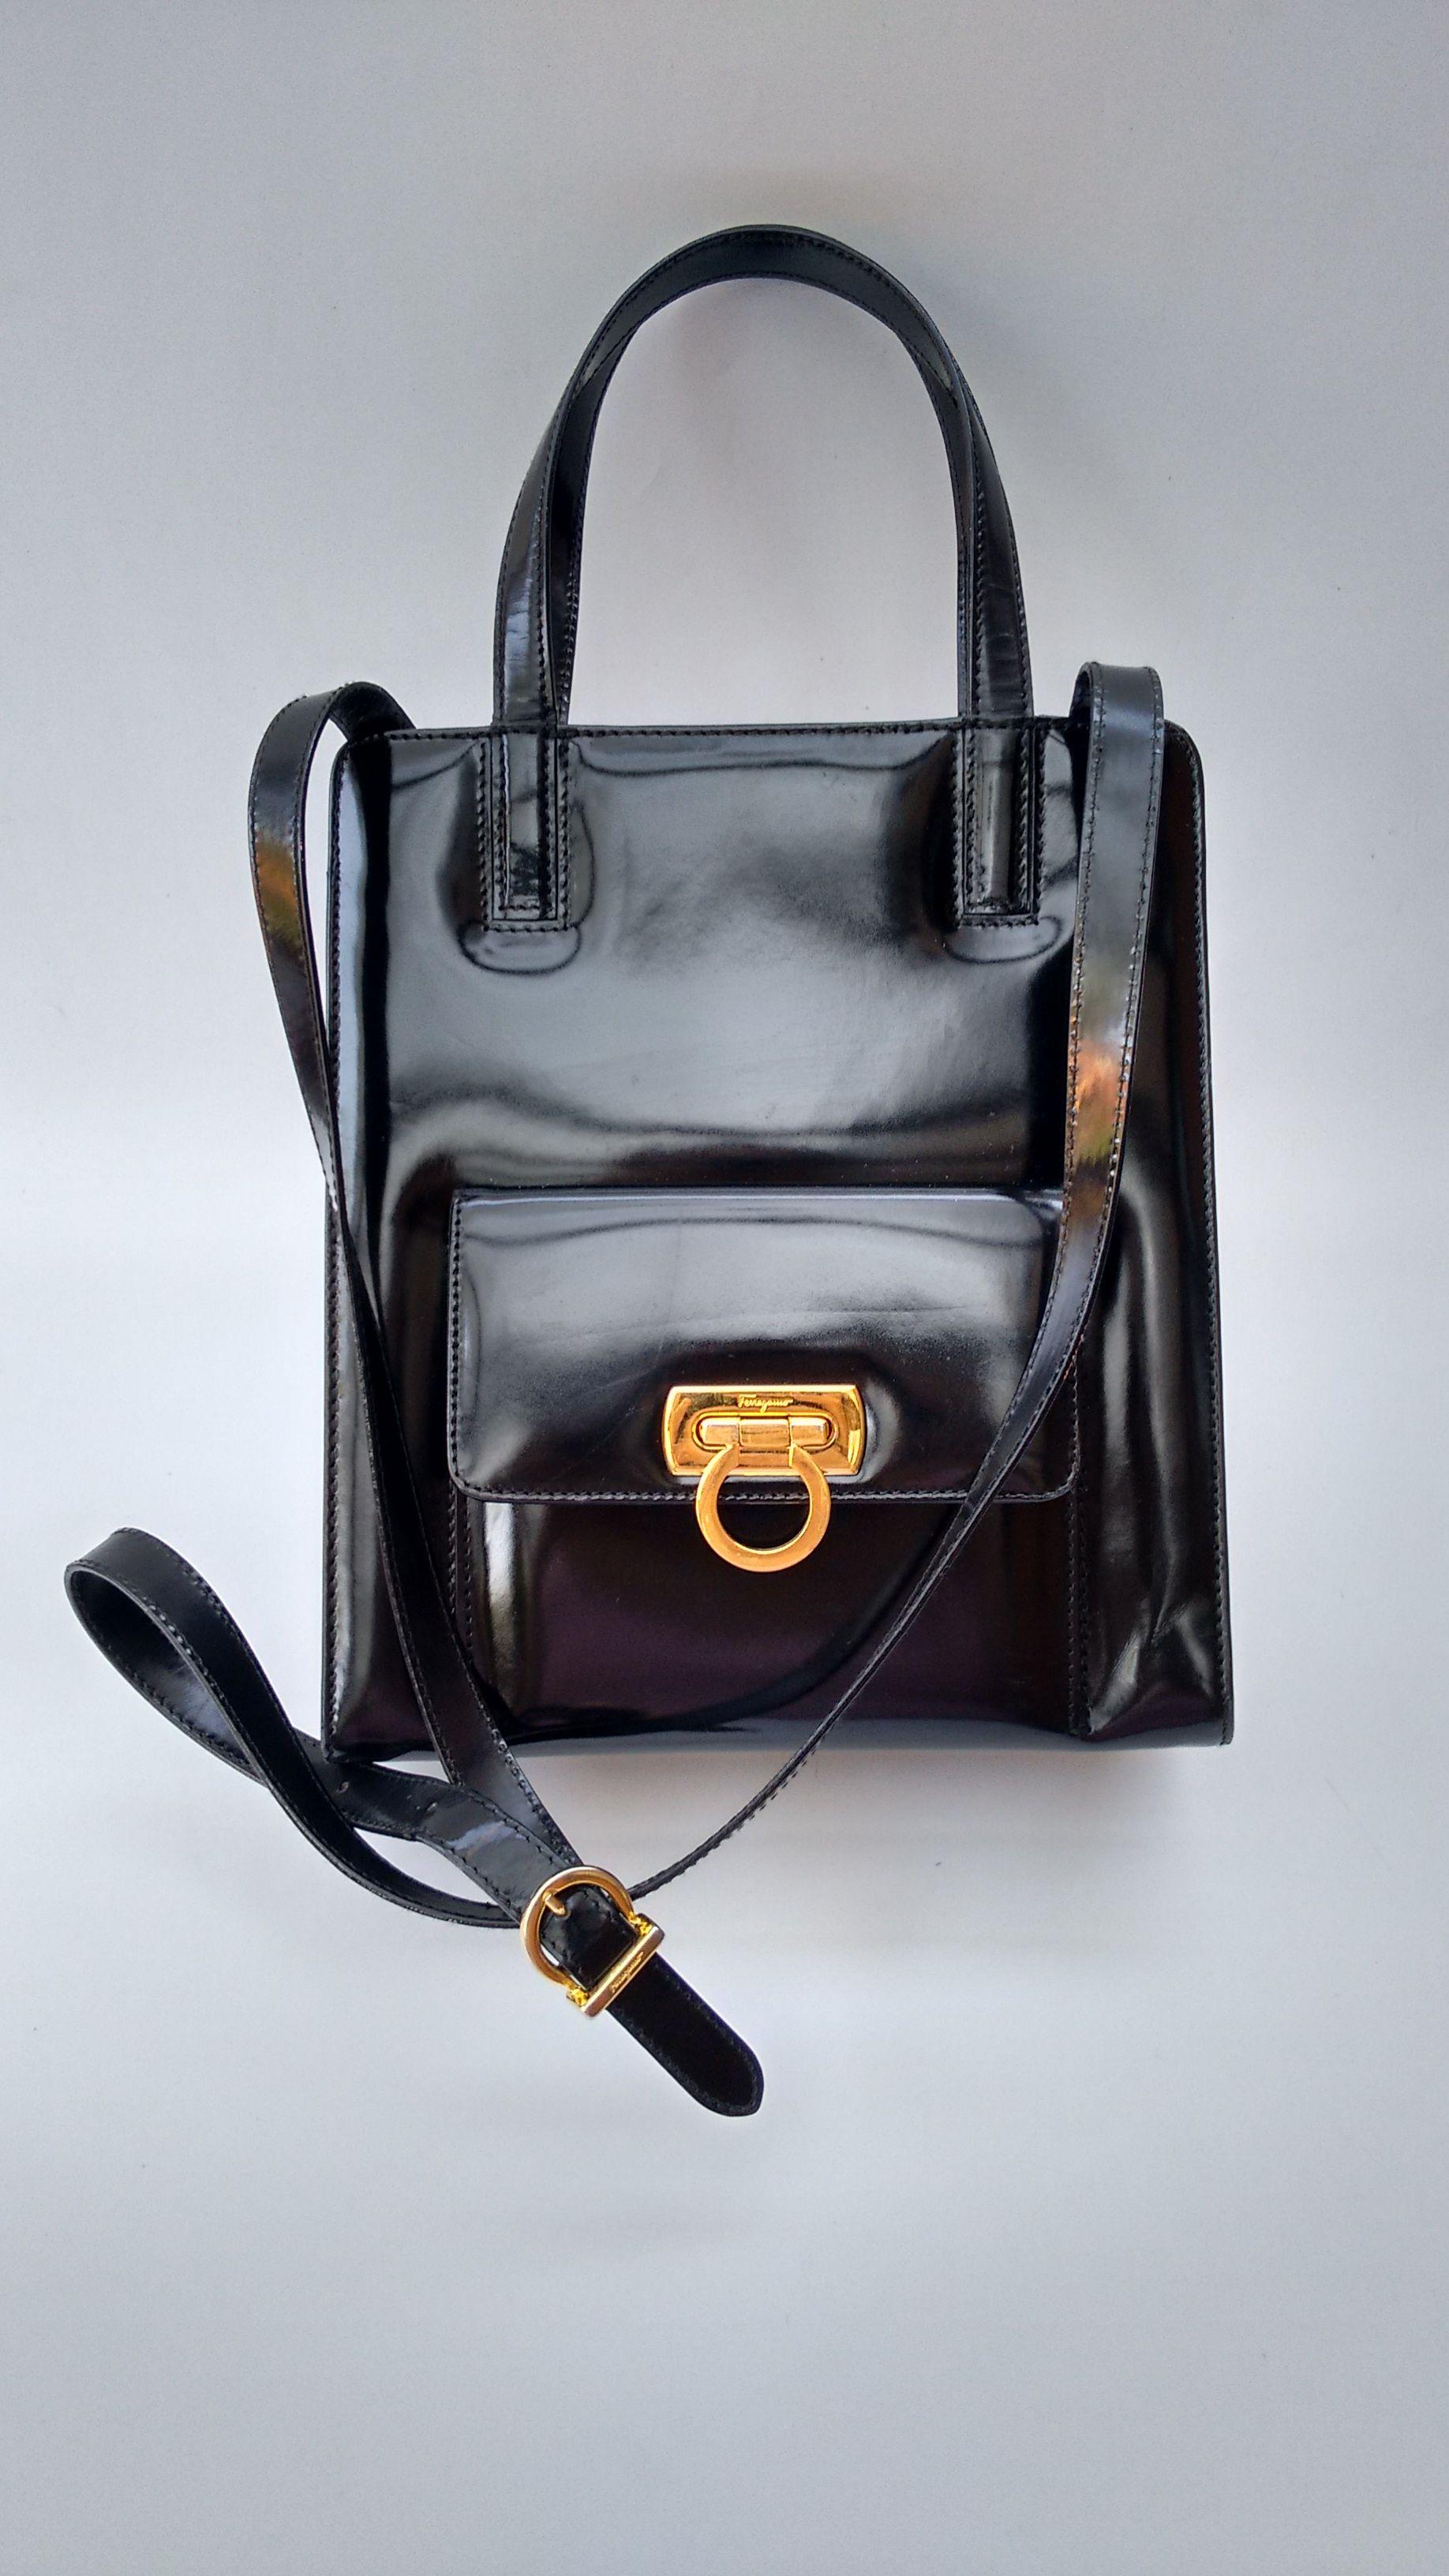 FERRAGAMO Bag. Salvatore Ferragamo Vintage Gancini Black Leather Shoulder  Bag. Italian designer purse. 76e90345b1